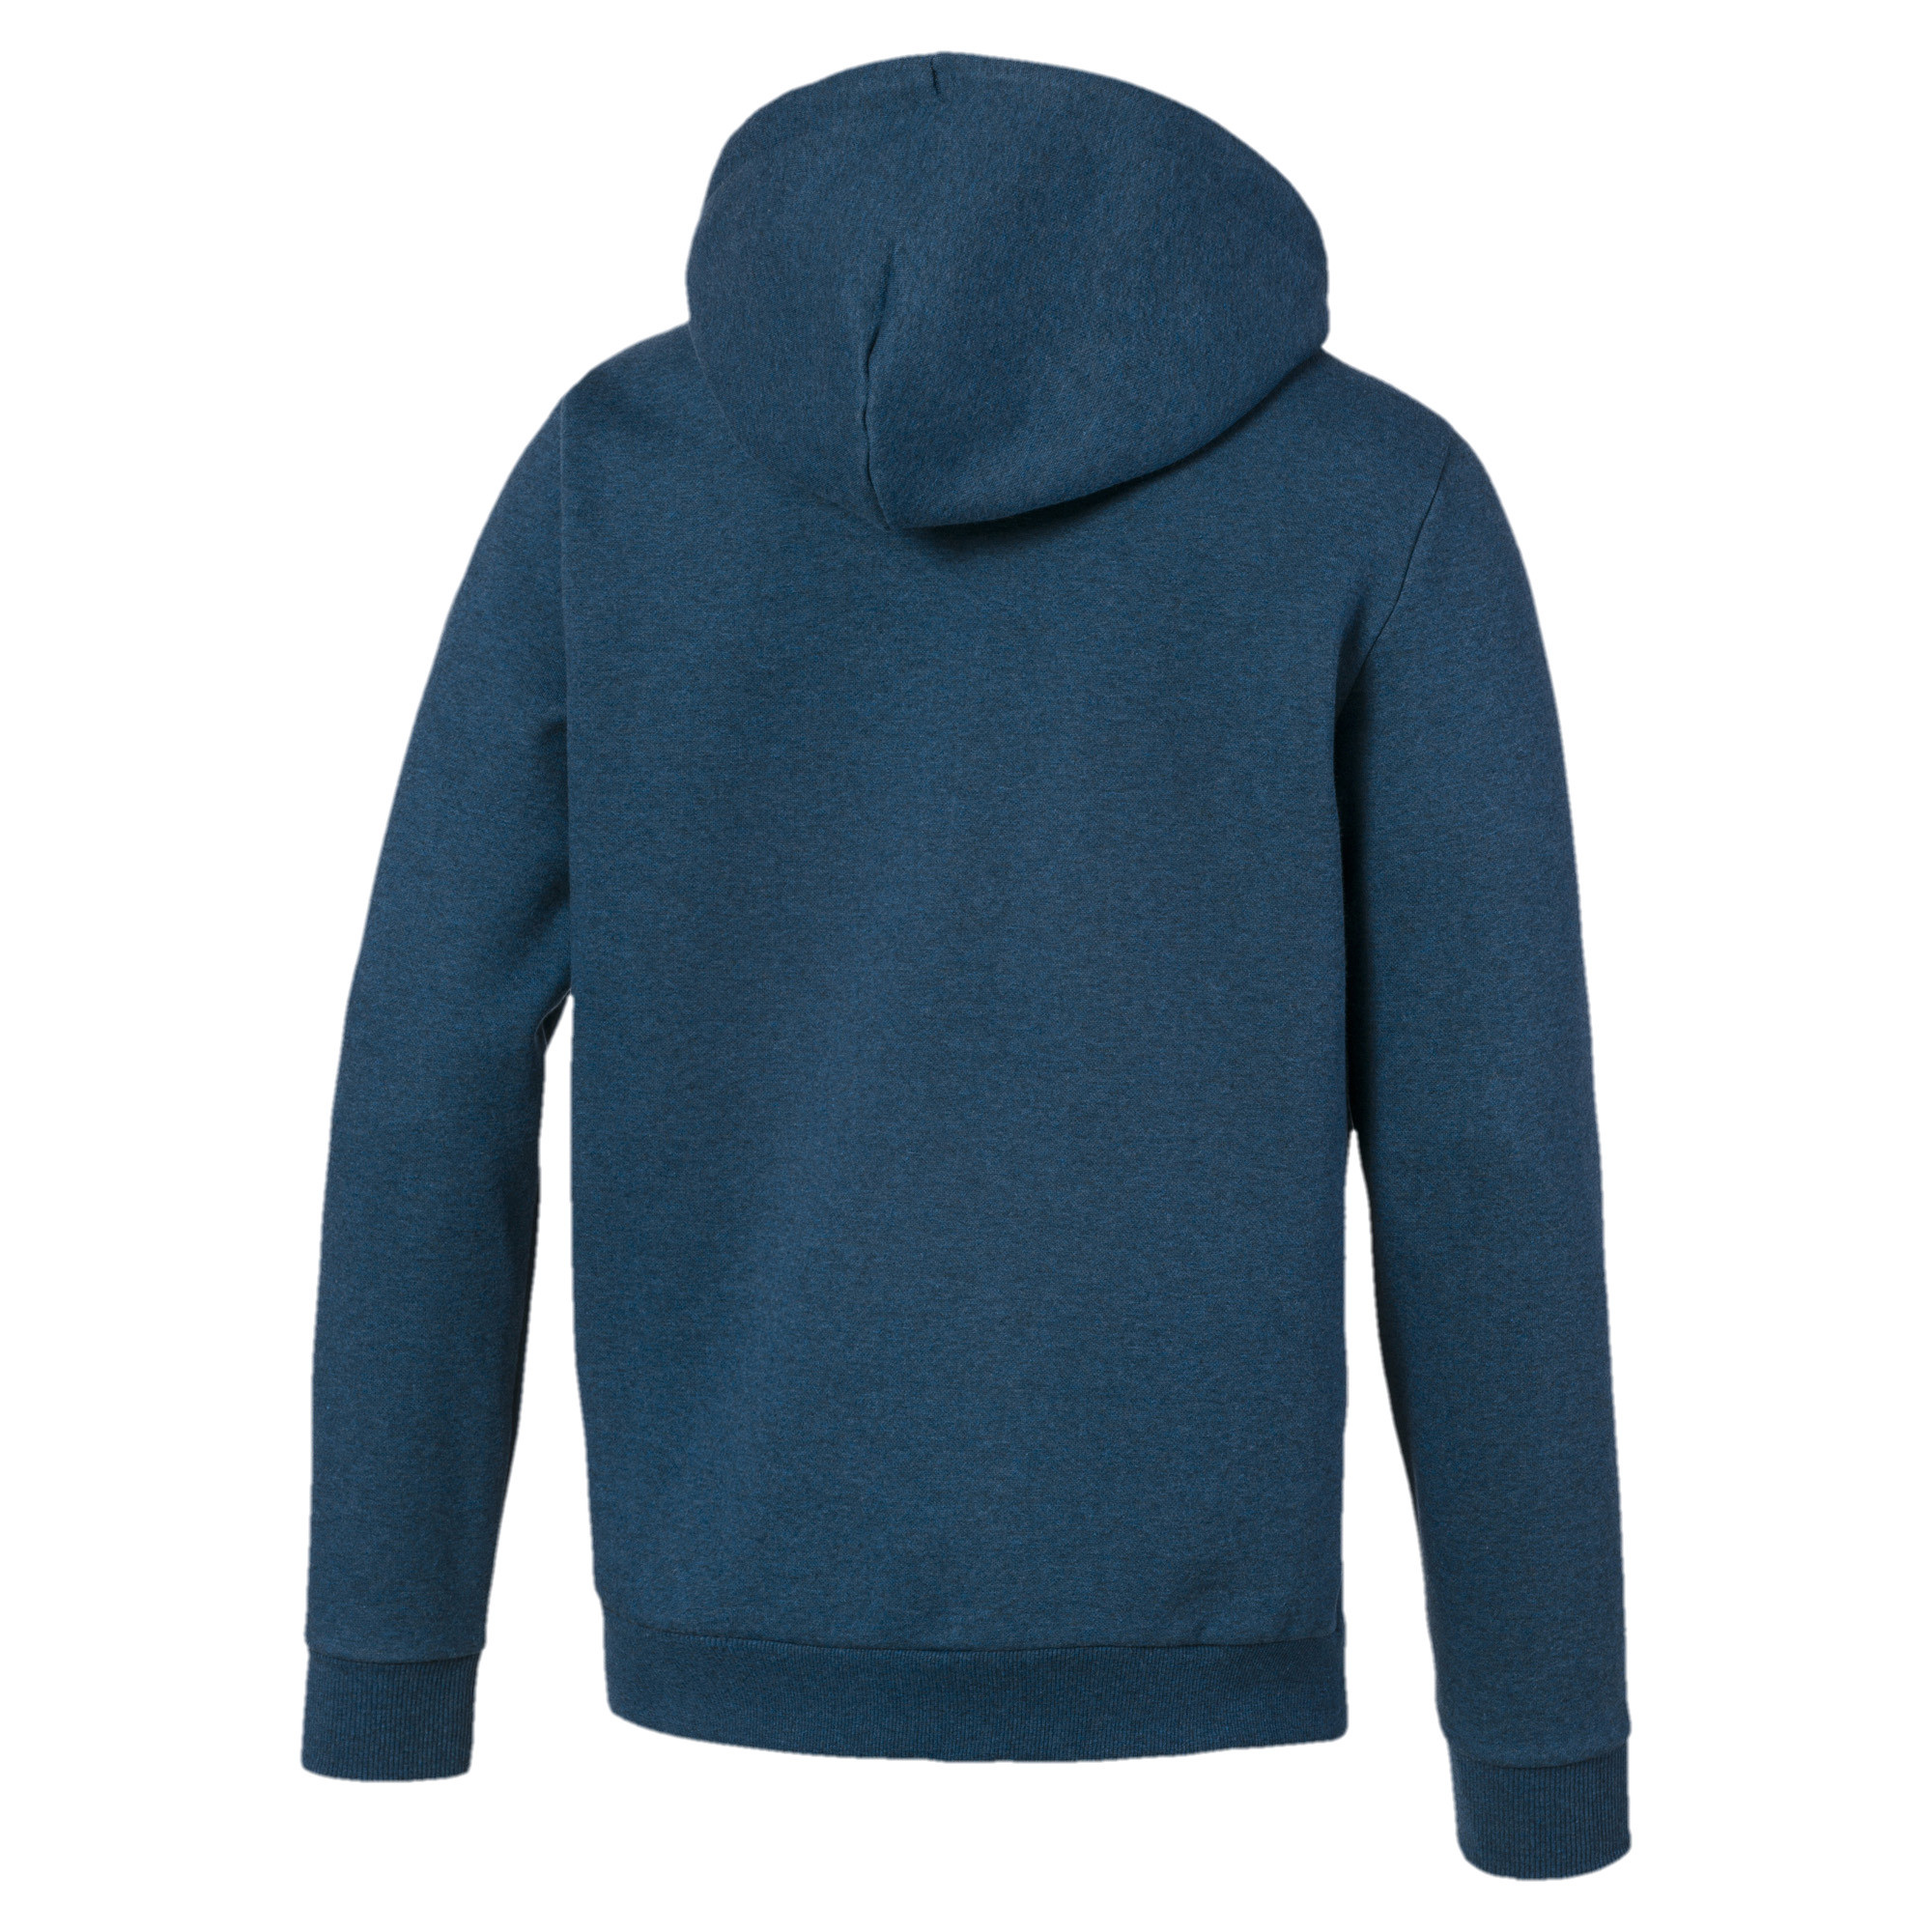 PUMA-Essentials-Men-039-s-Fleece-Hooded-Jacket-Men-Sweat-Basics thumbnail 16